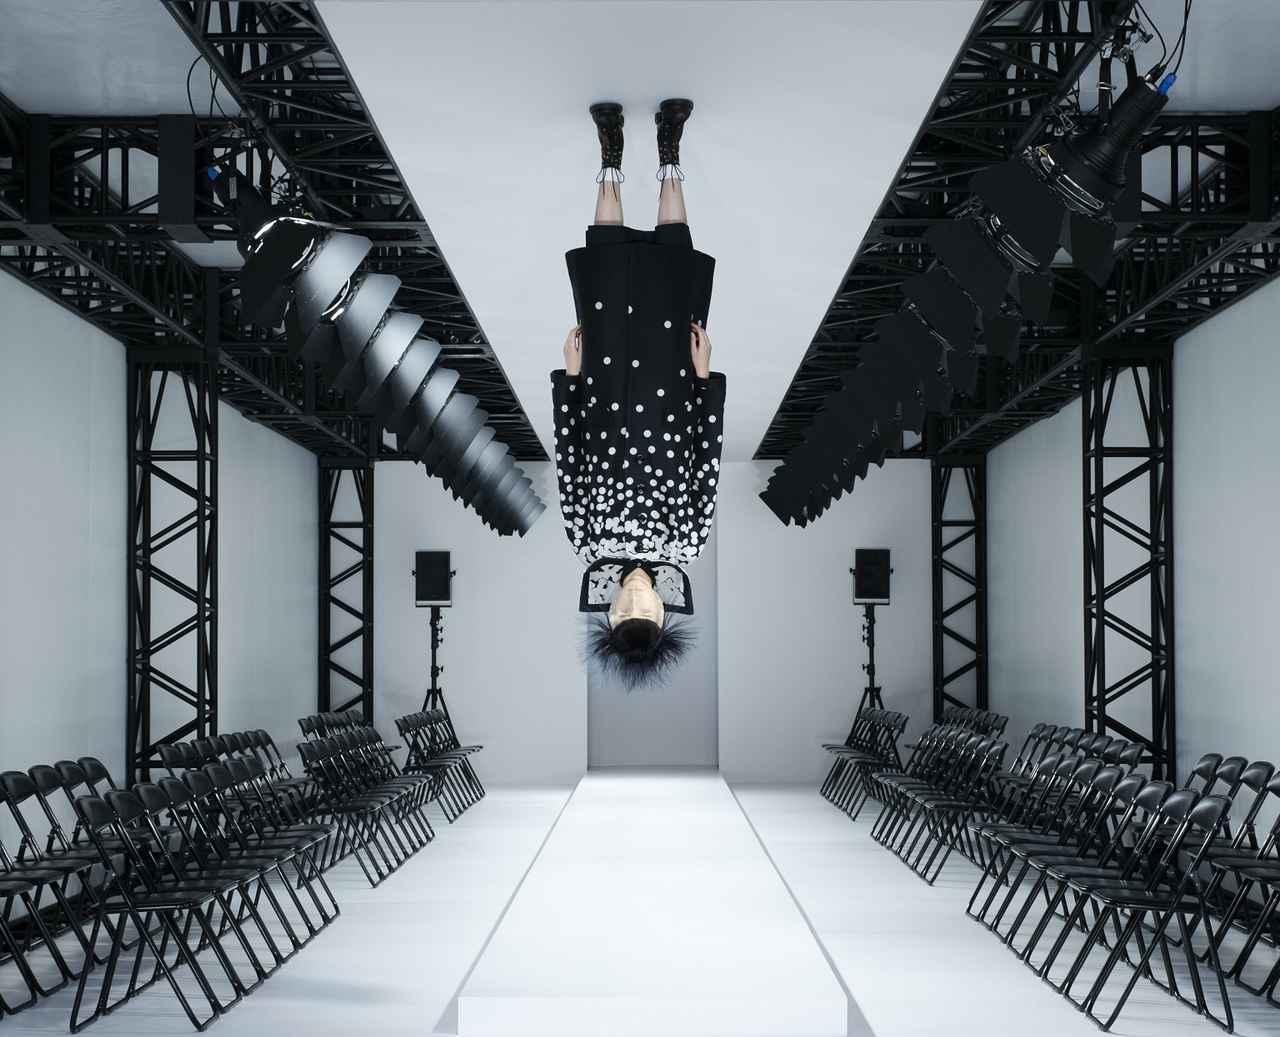 Images : アンリアレイジ展覧会『AとZ』|三菱地所アルティアム